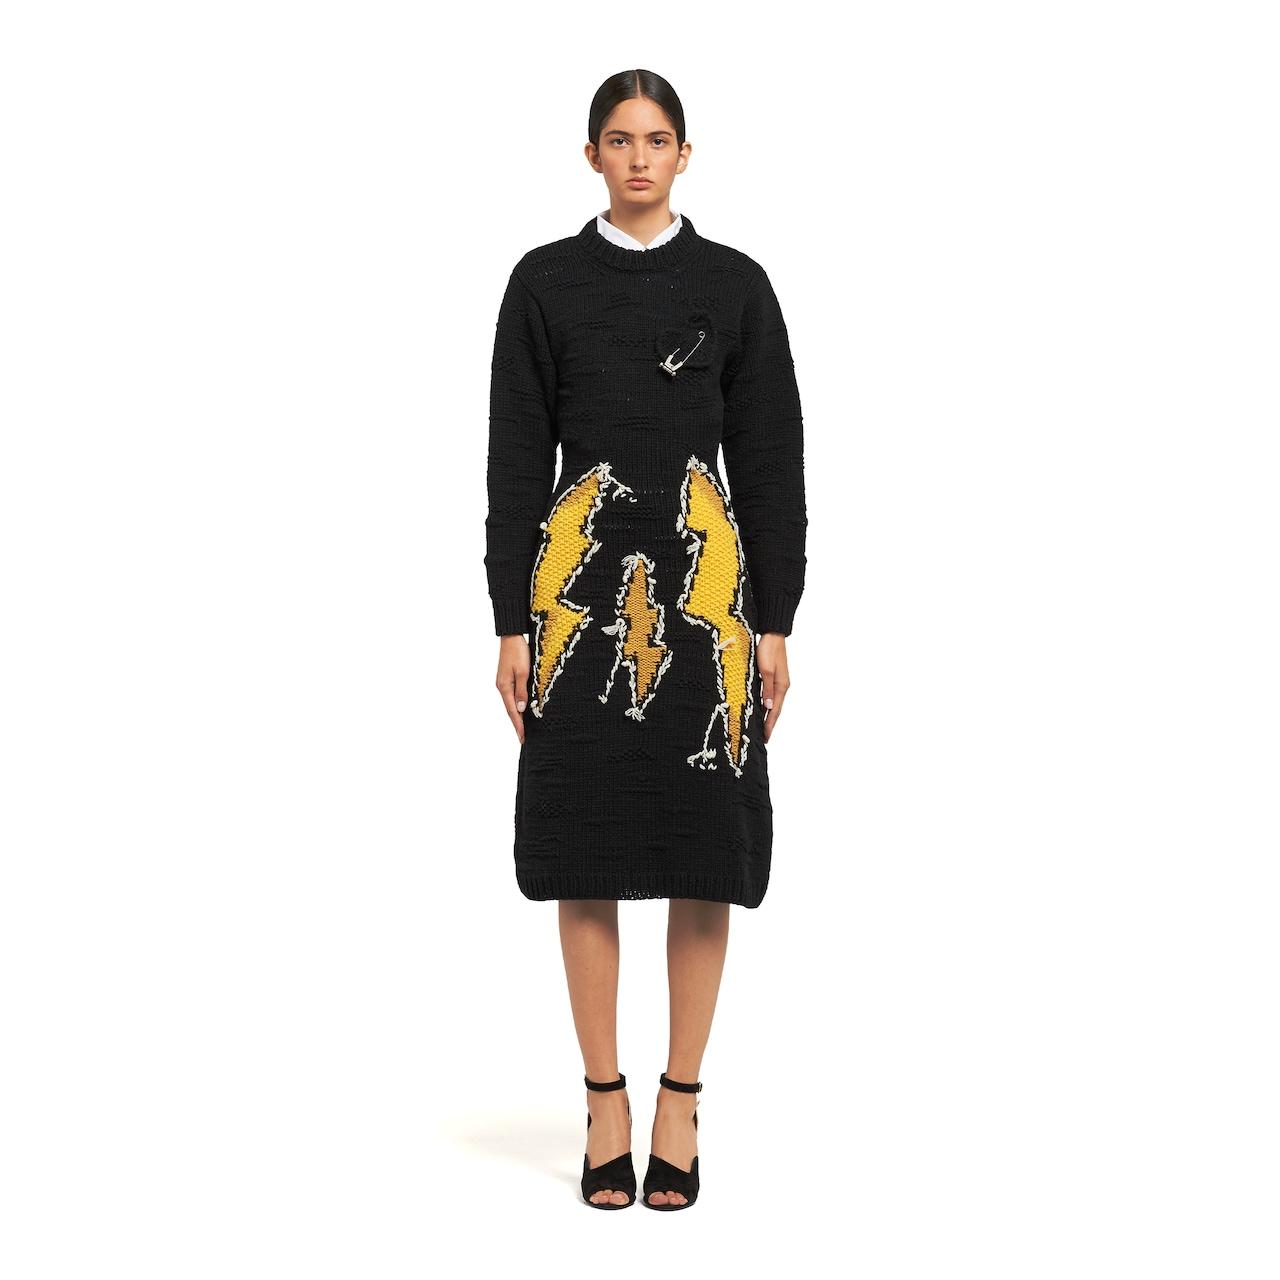 Shetland dress